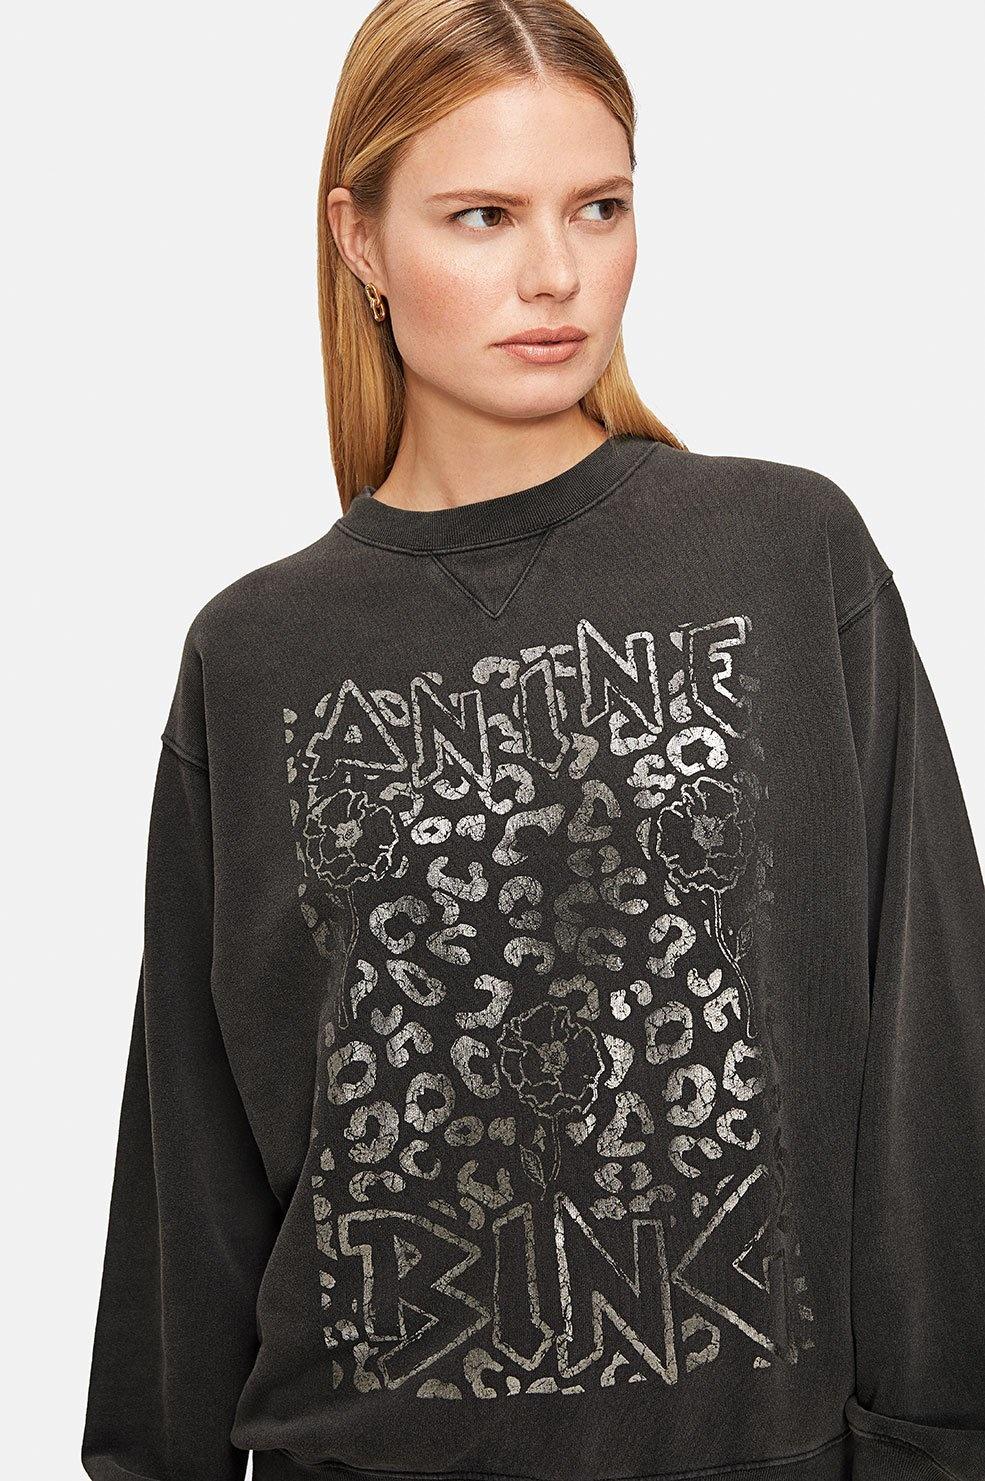 Ramona Leopard Sweatshirt - Washed Black-6